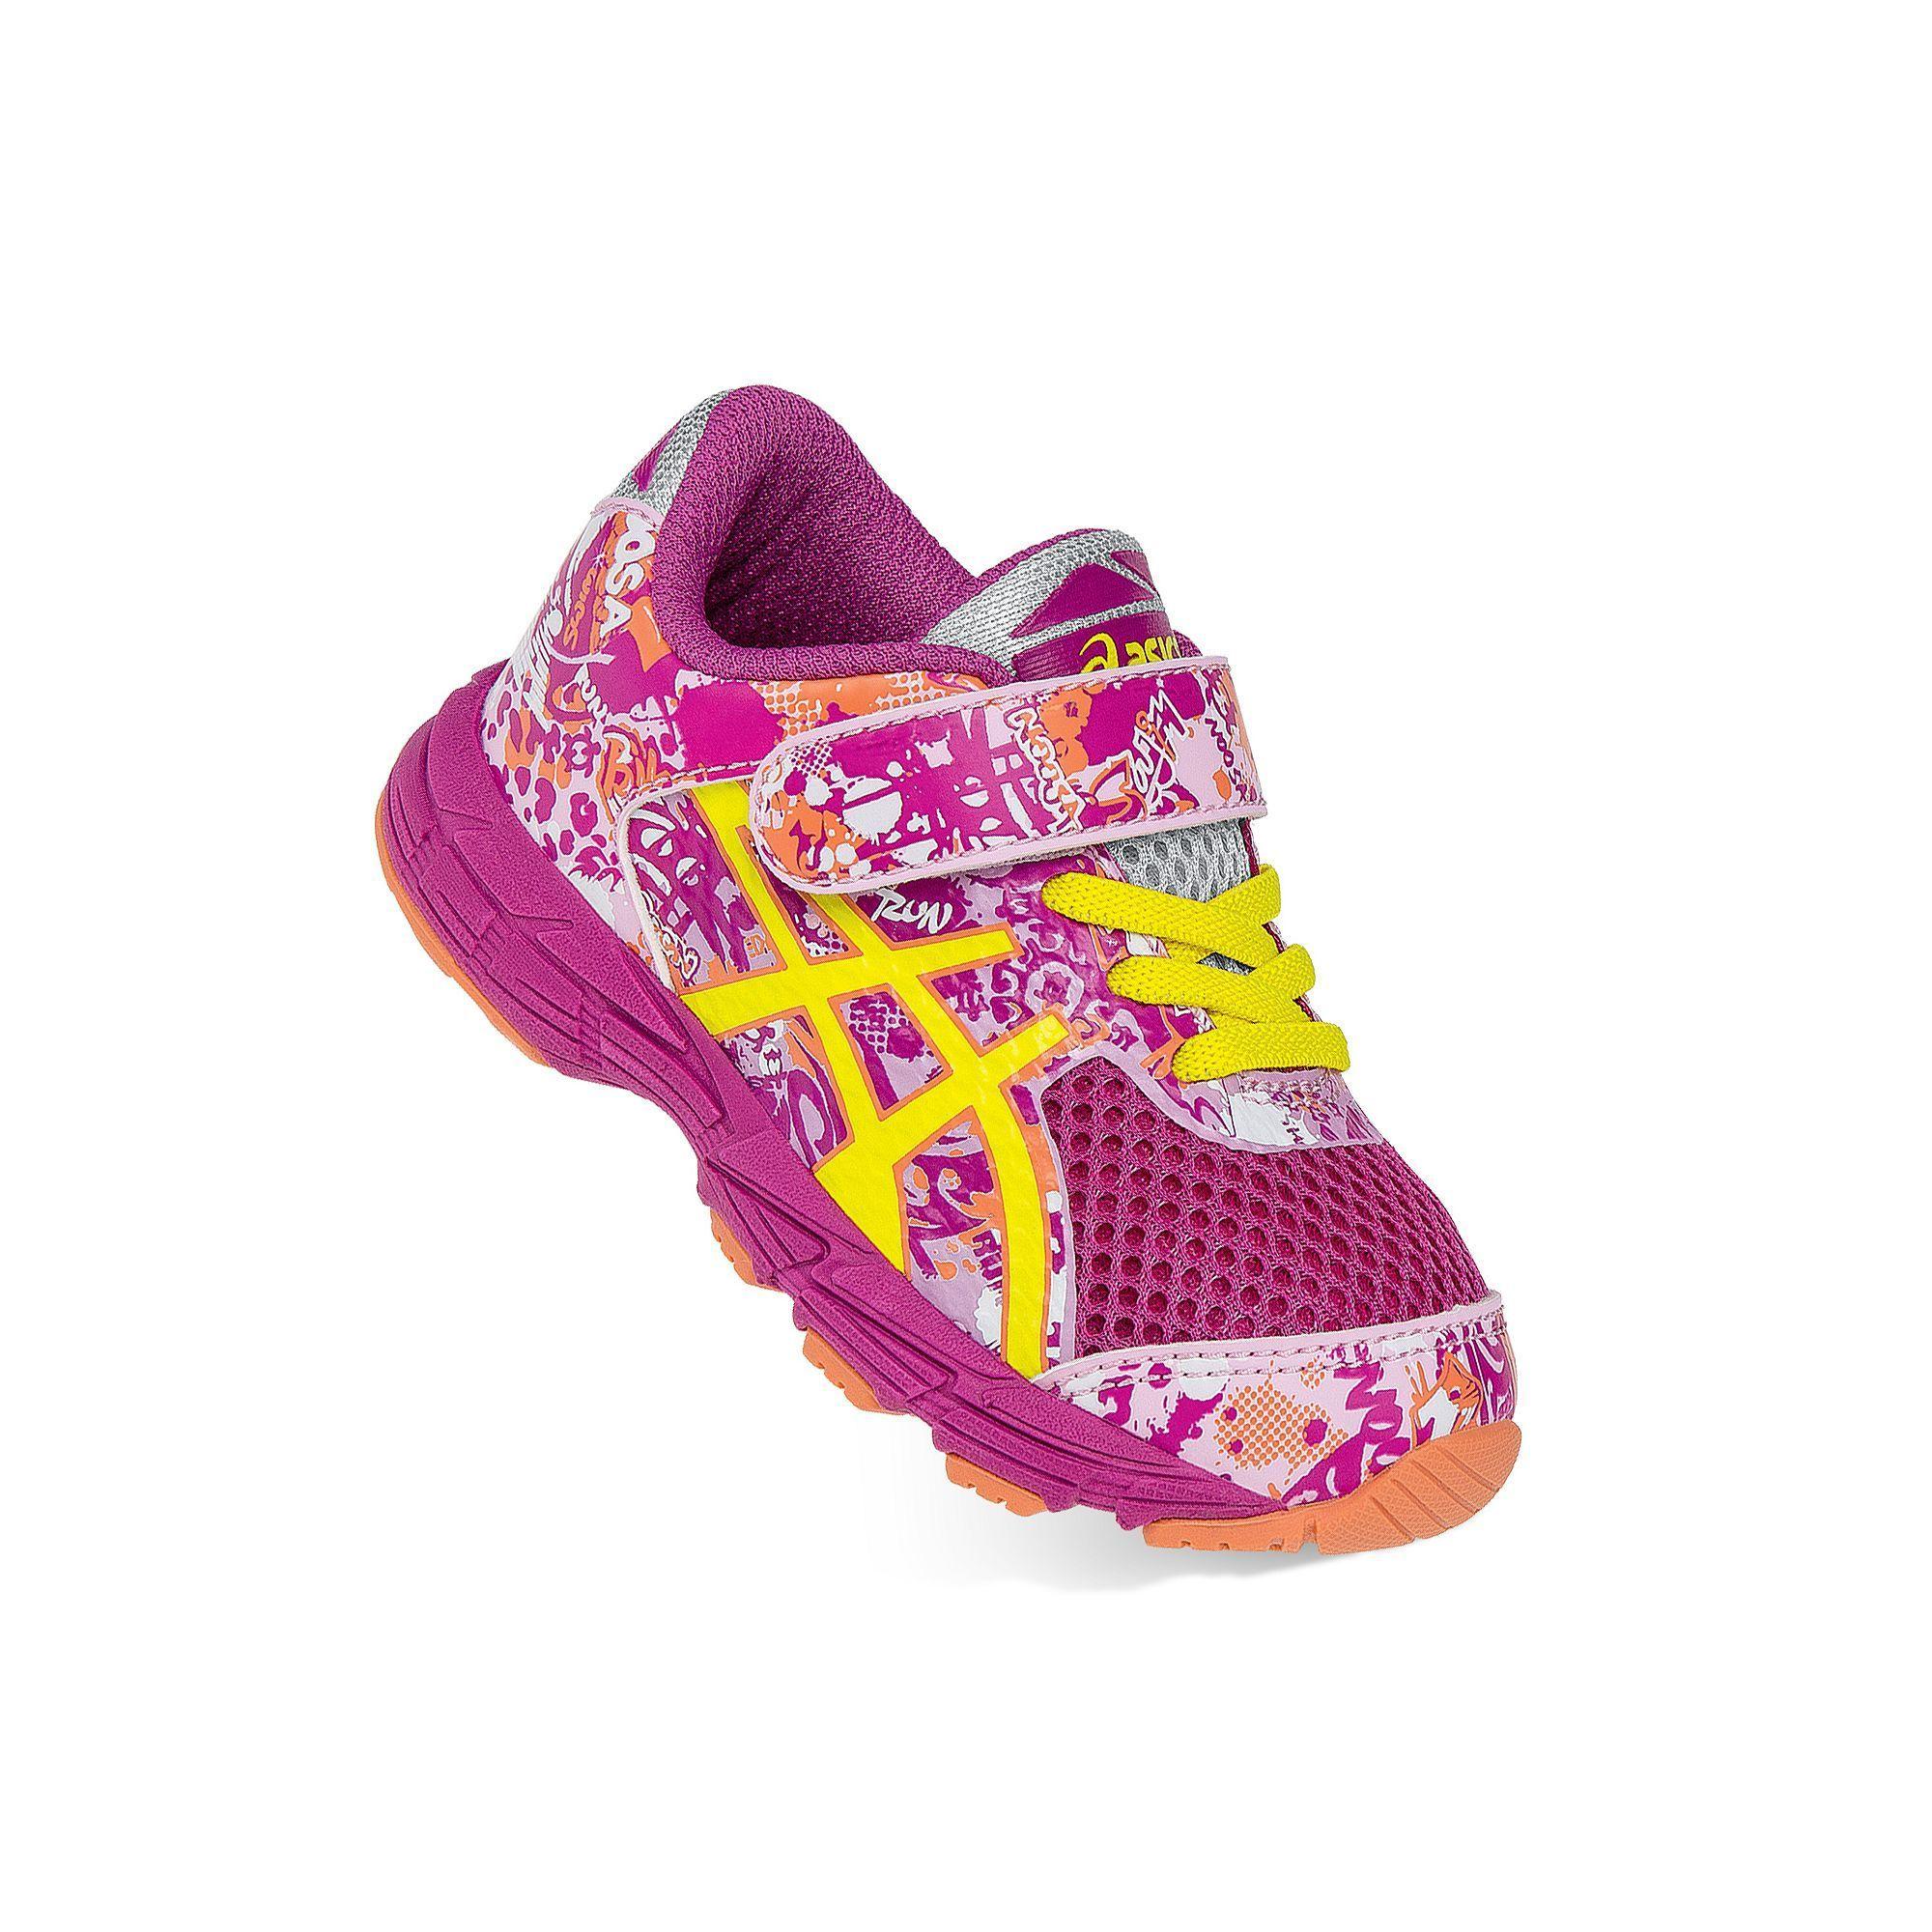 huge discount e75cb 2a4c5 ASICS GEL-Noosa Tri 11 Toddler Girls' Running Shoes ...